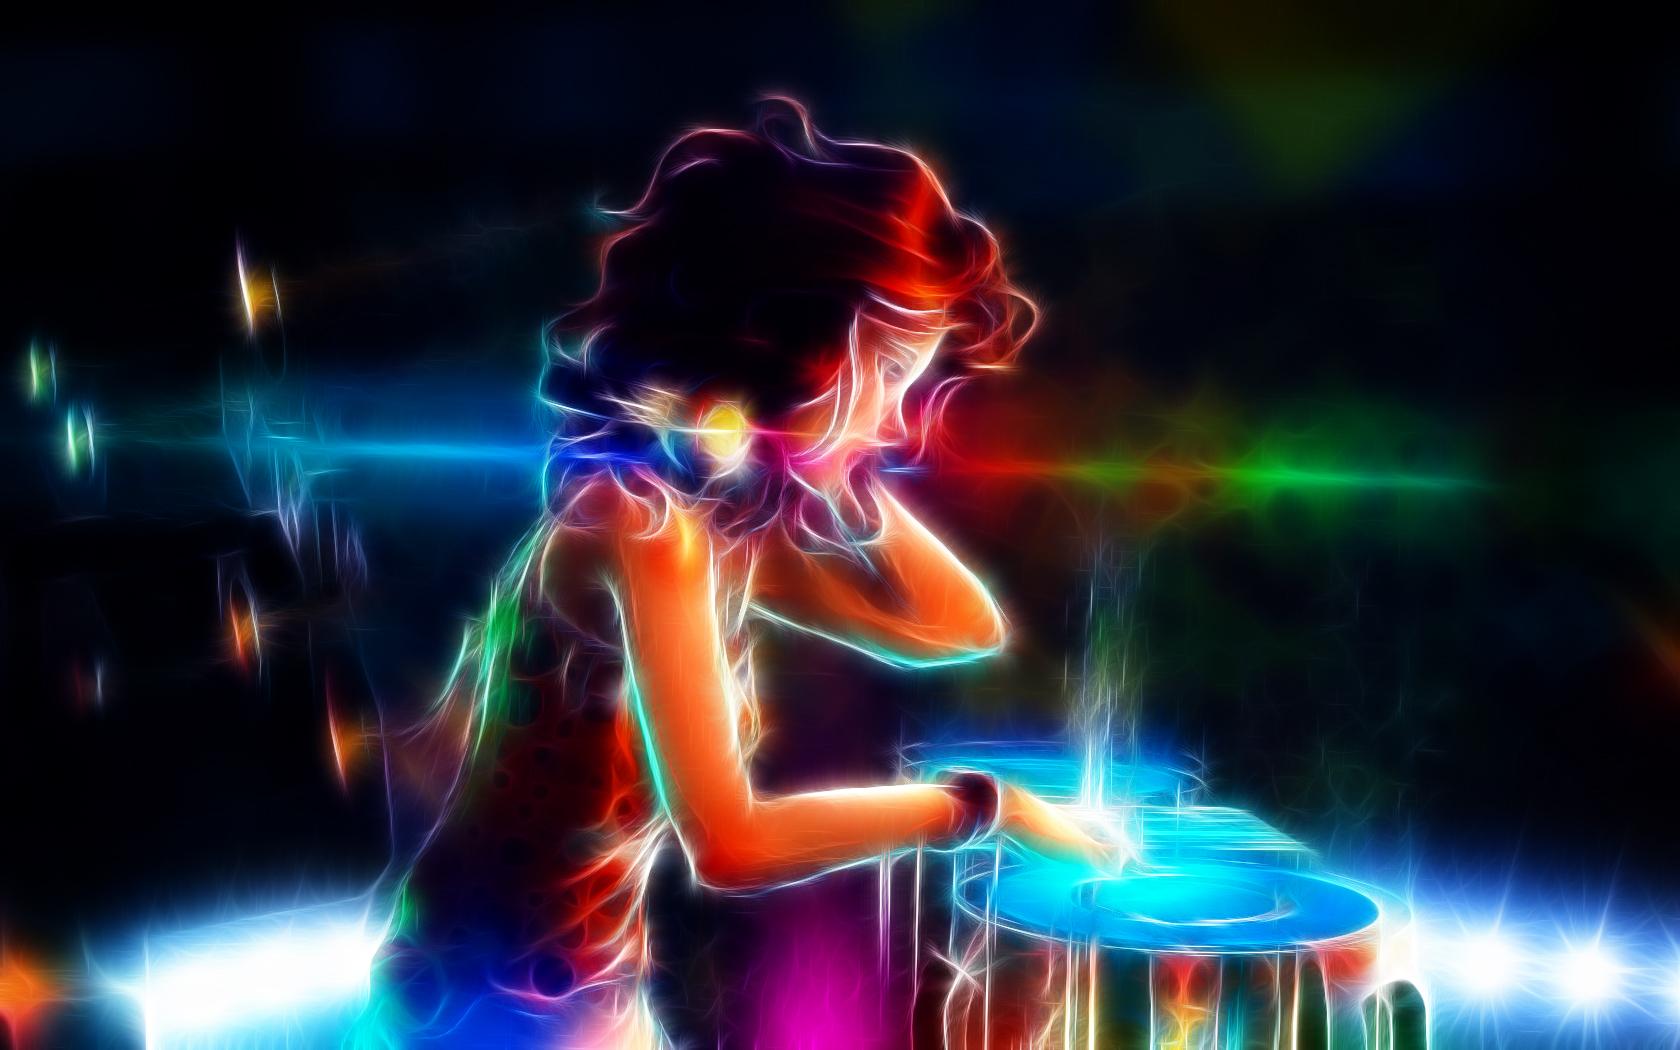 DJ Girl Fractal by Trosik on deviantART 1680x1050